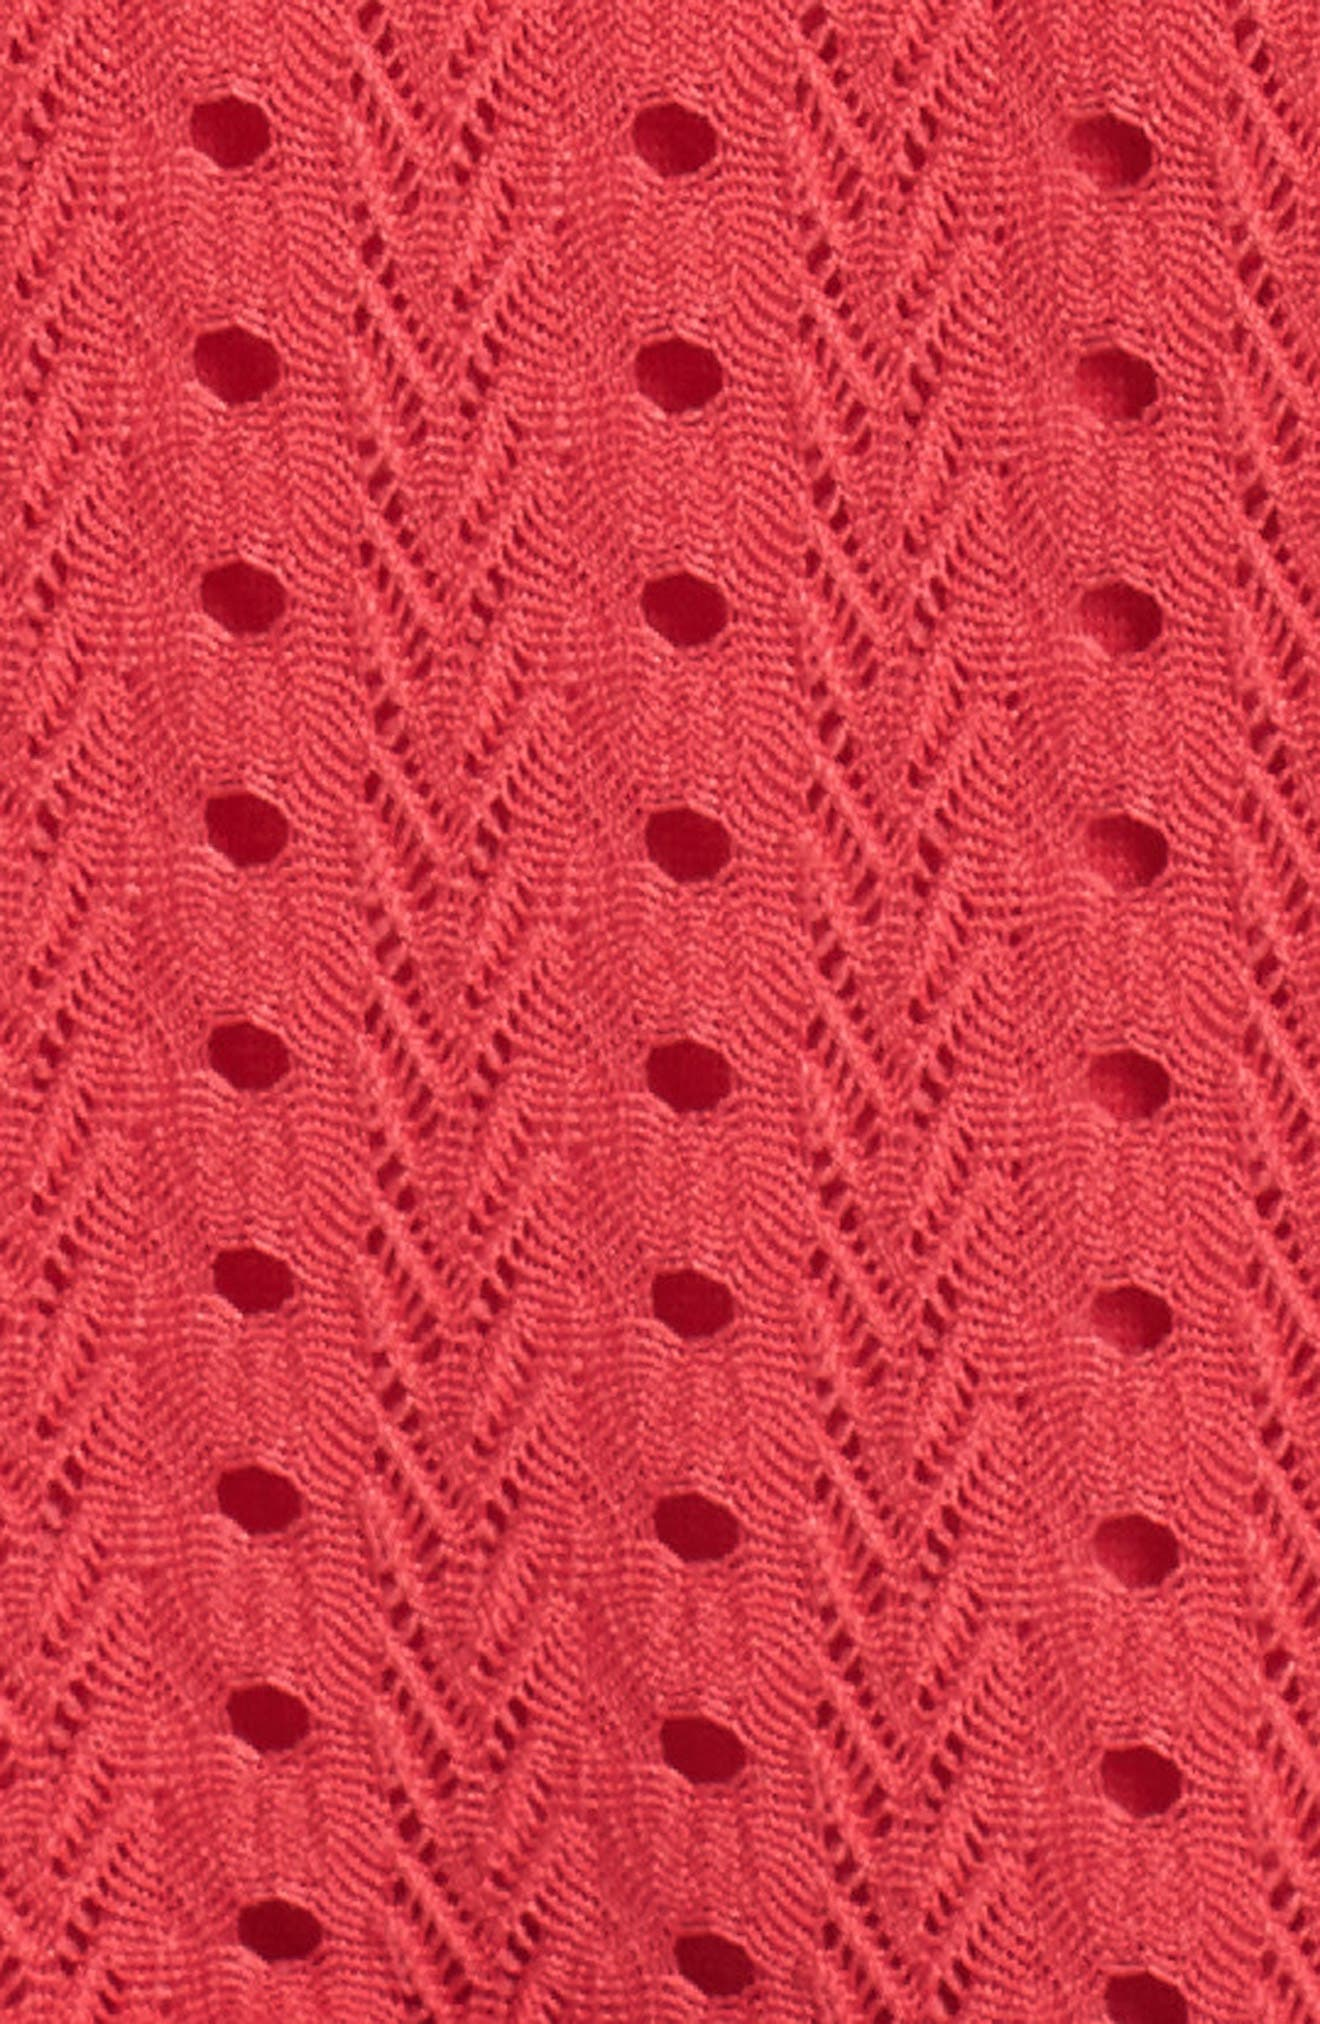 Sleeveless Ruffle Knit Sheath Dress,                             Alternate thumbnail 6, color,                             Pink Rose